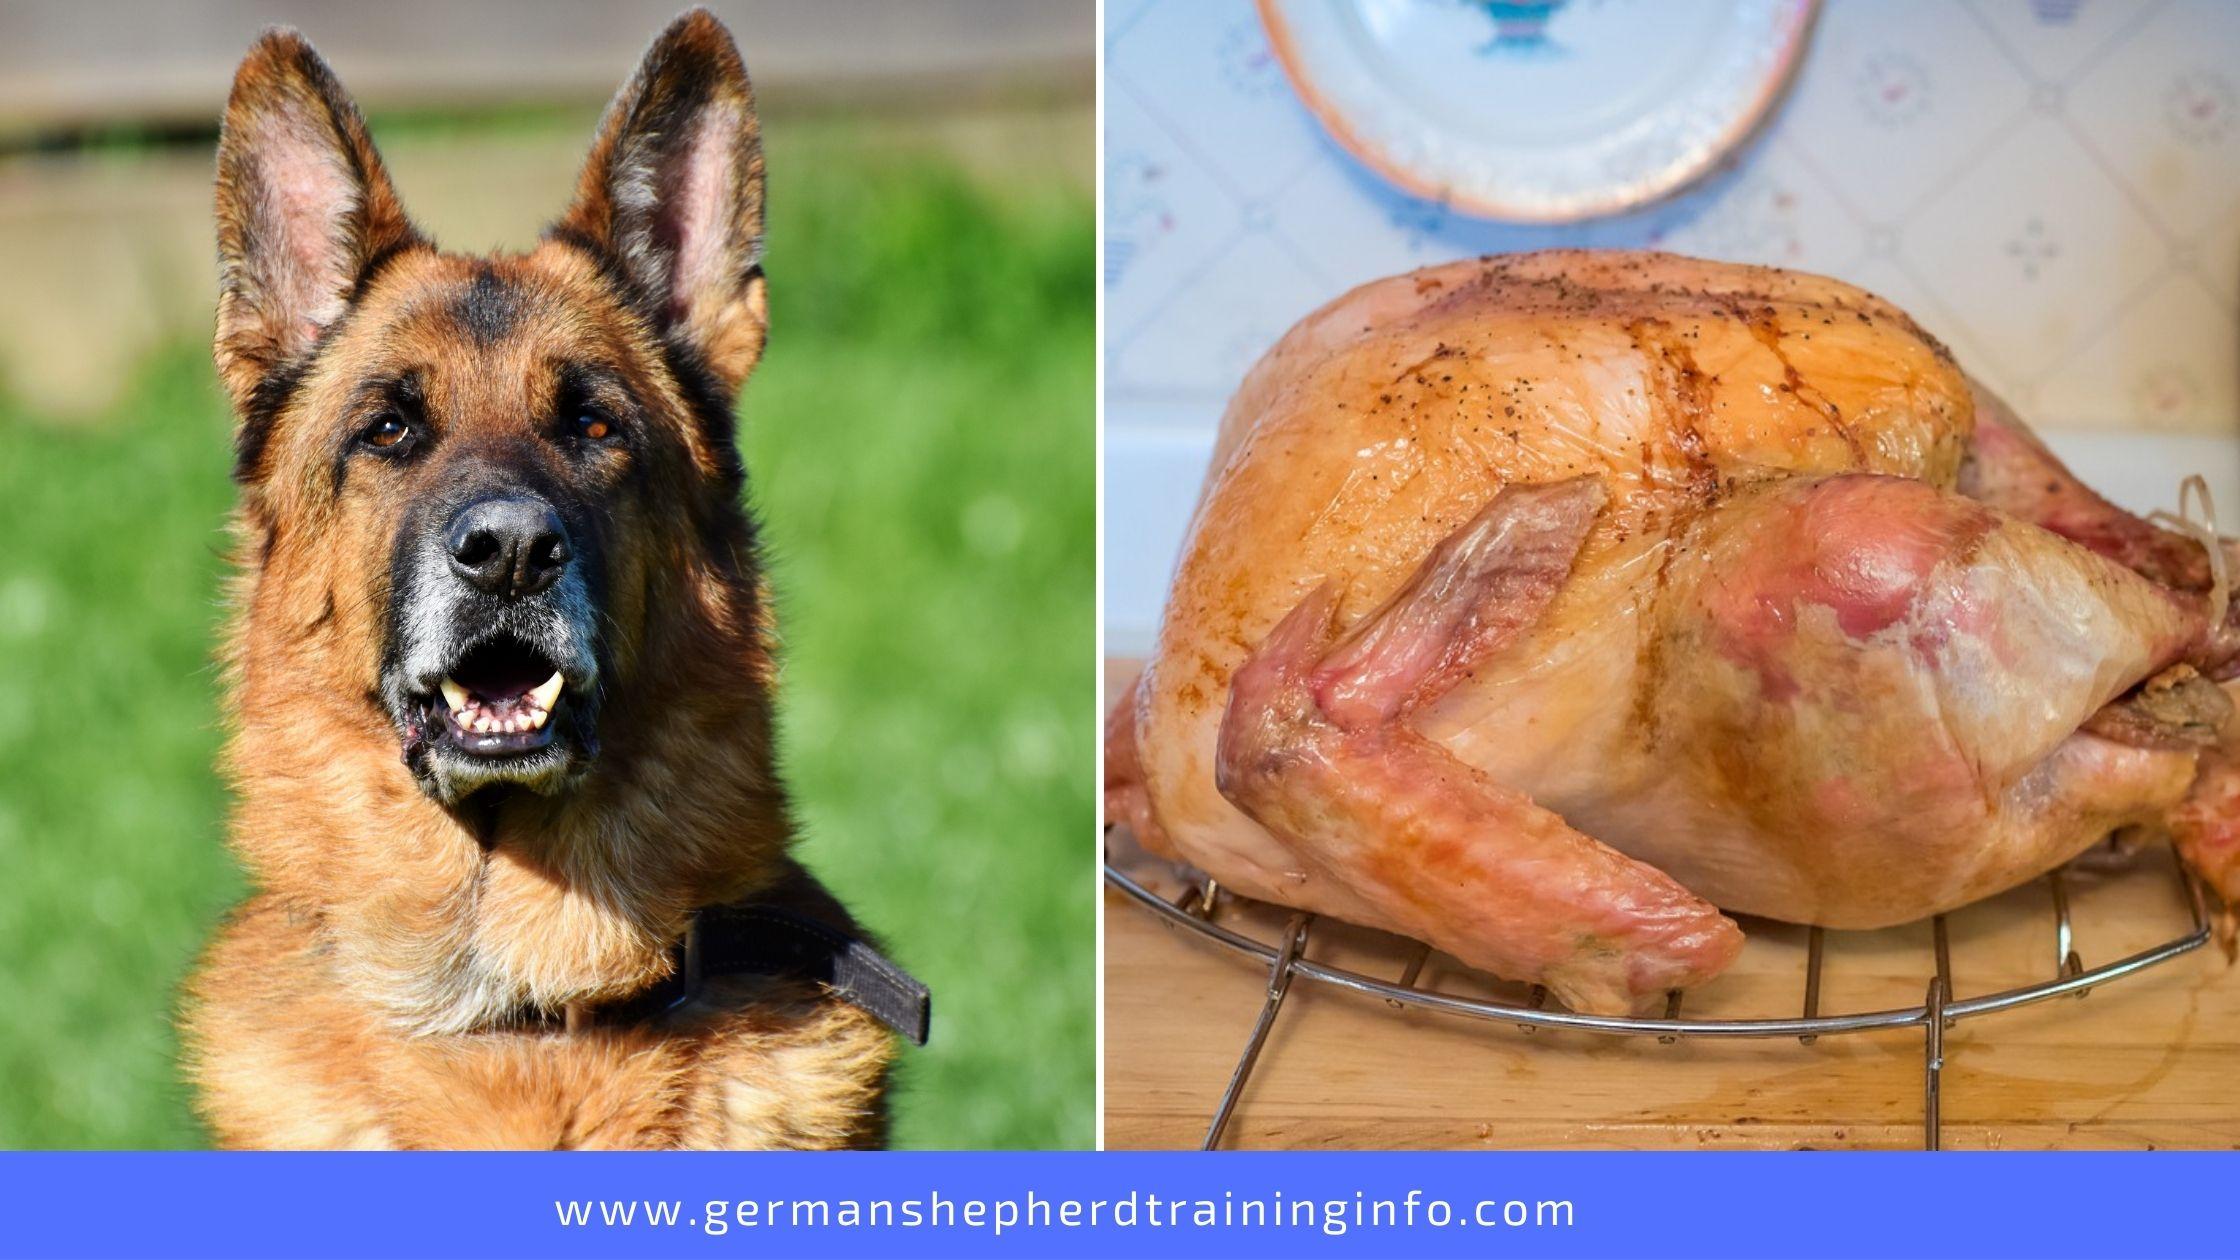 Can German Shepherds eat Turkey?